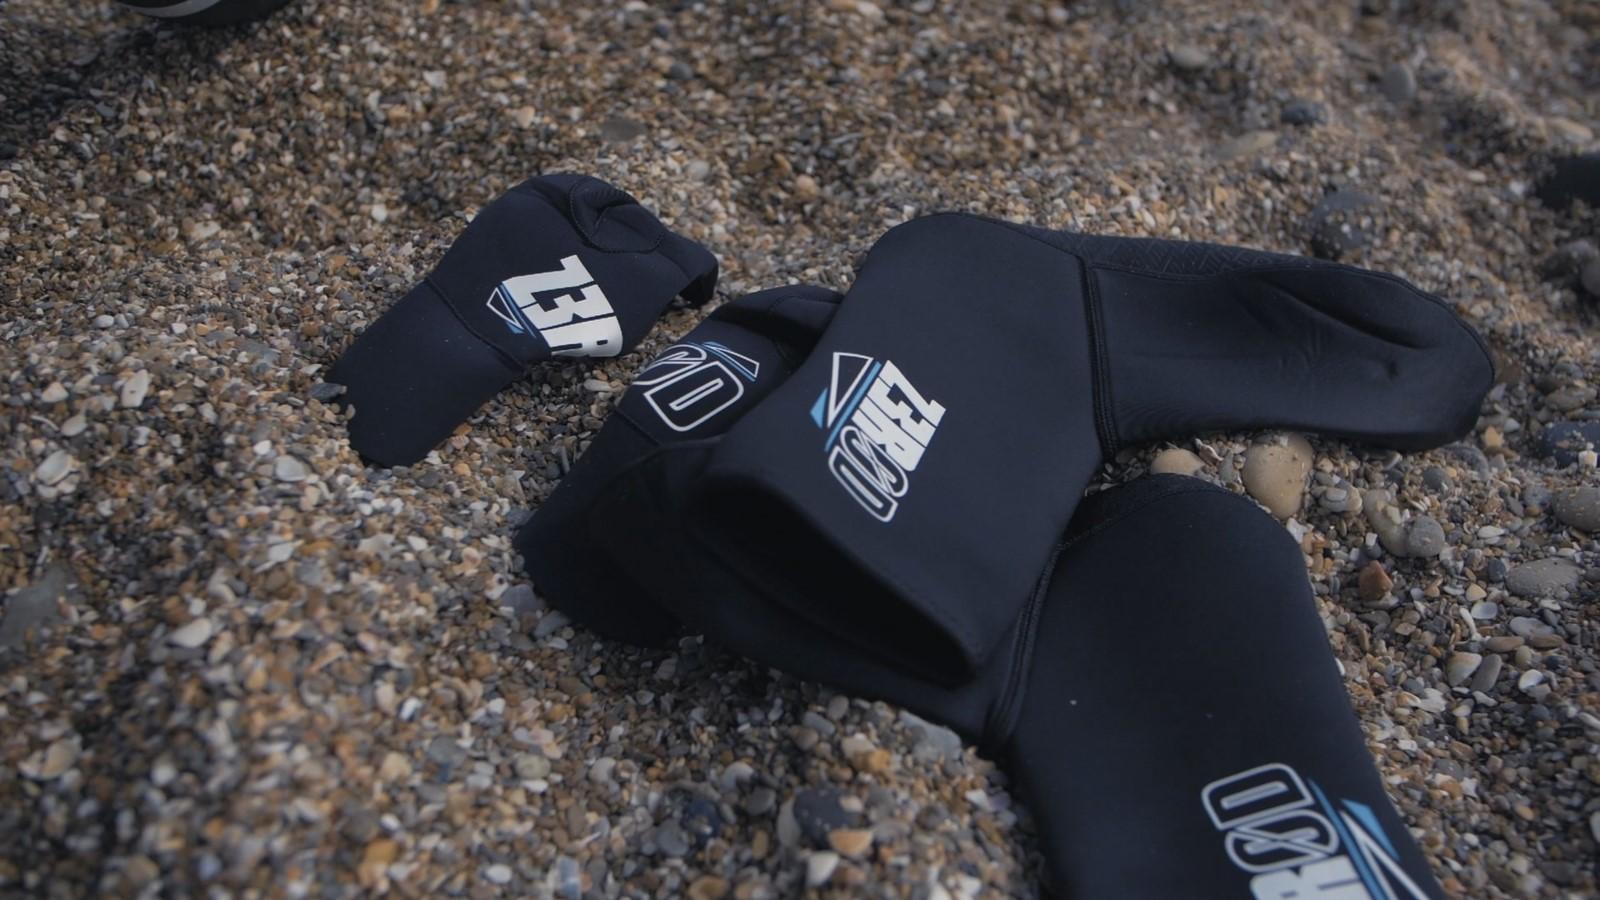 🔙  Back in stock! Open water neoprene accessories